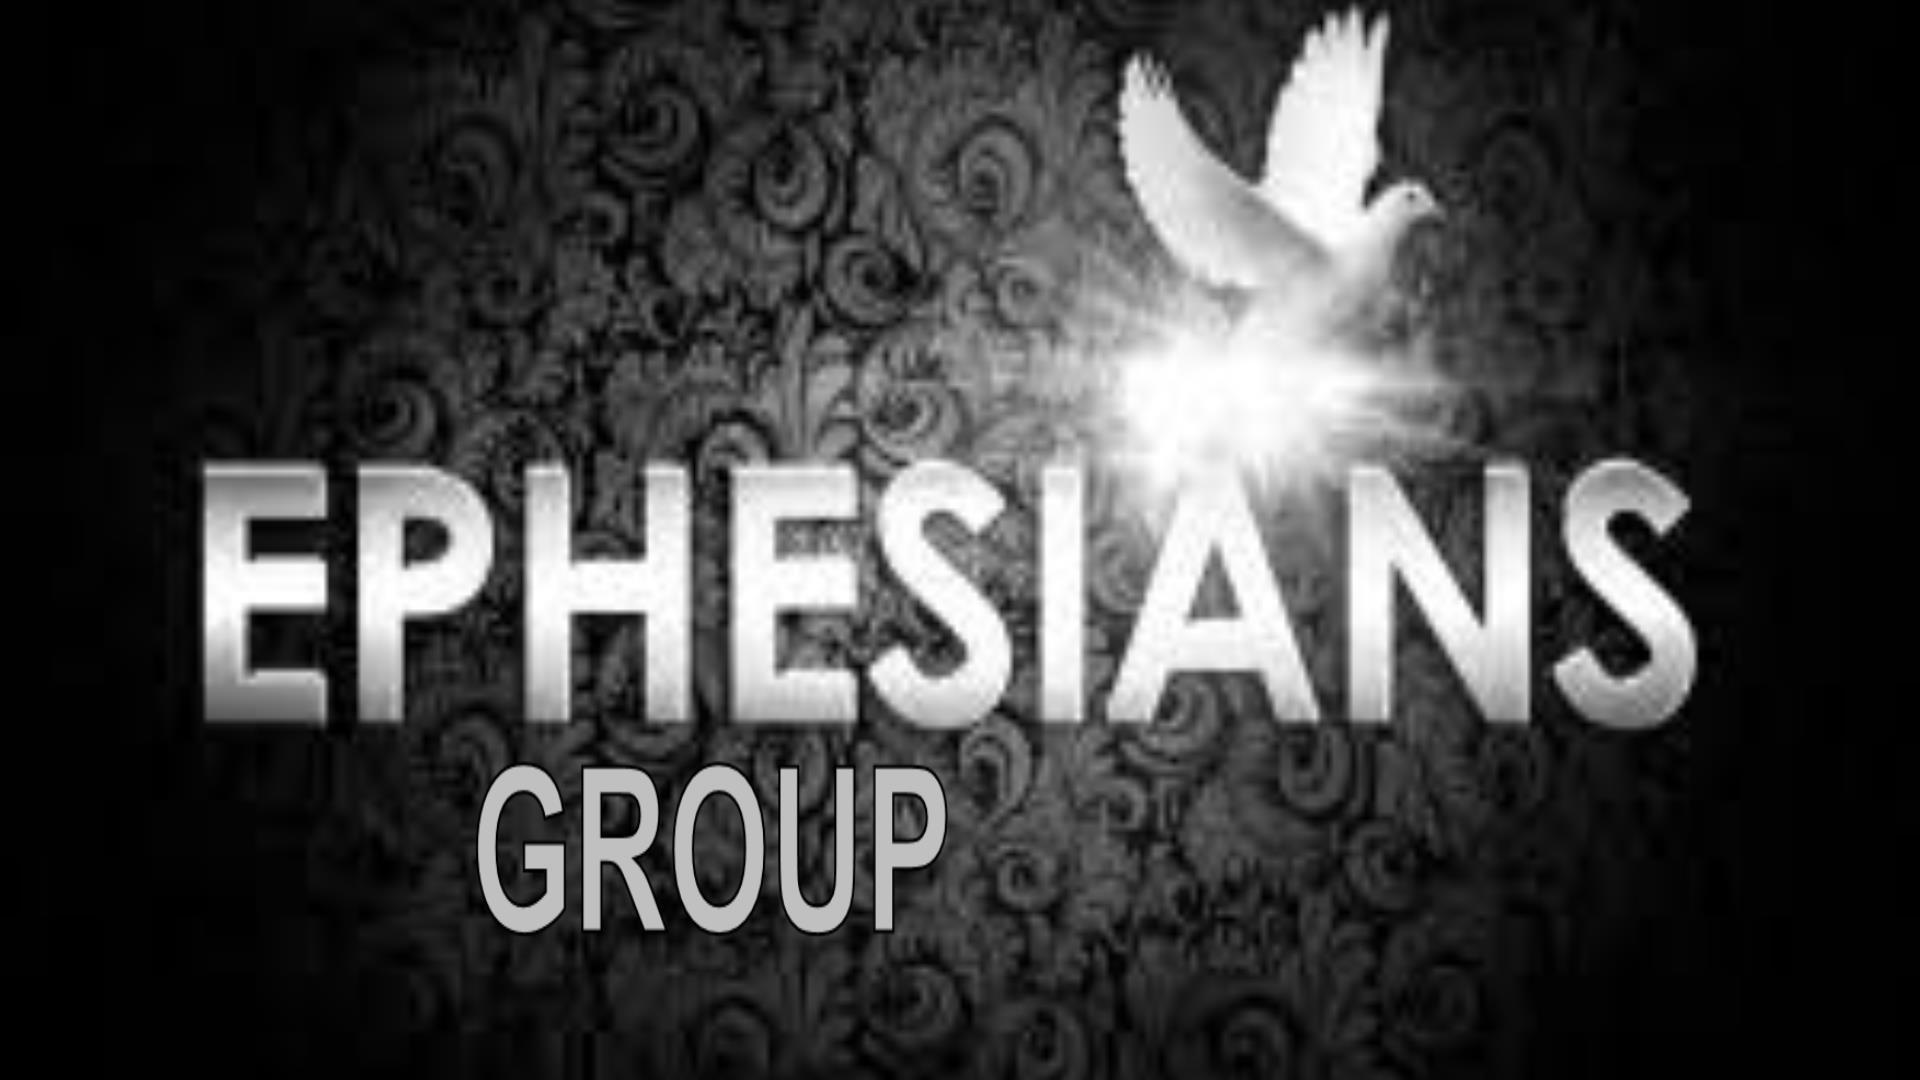 EPHESIAN GROUP